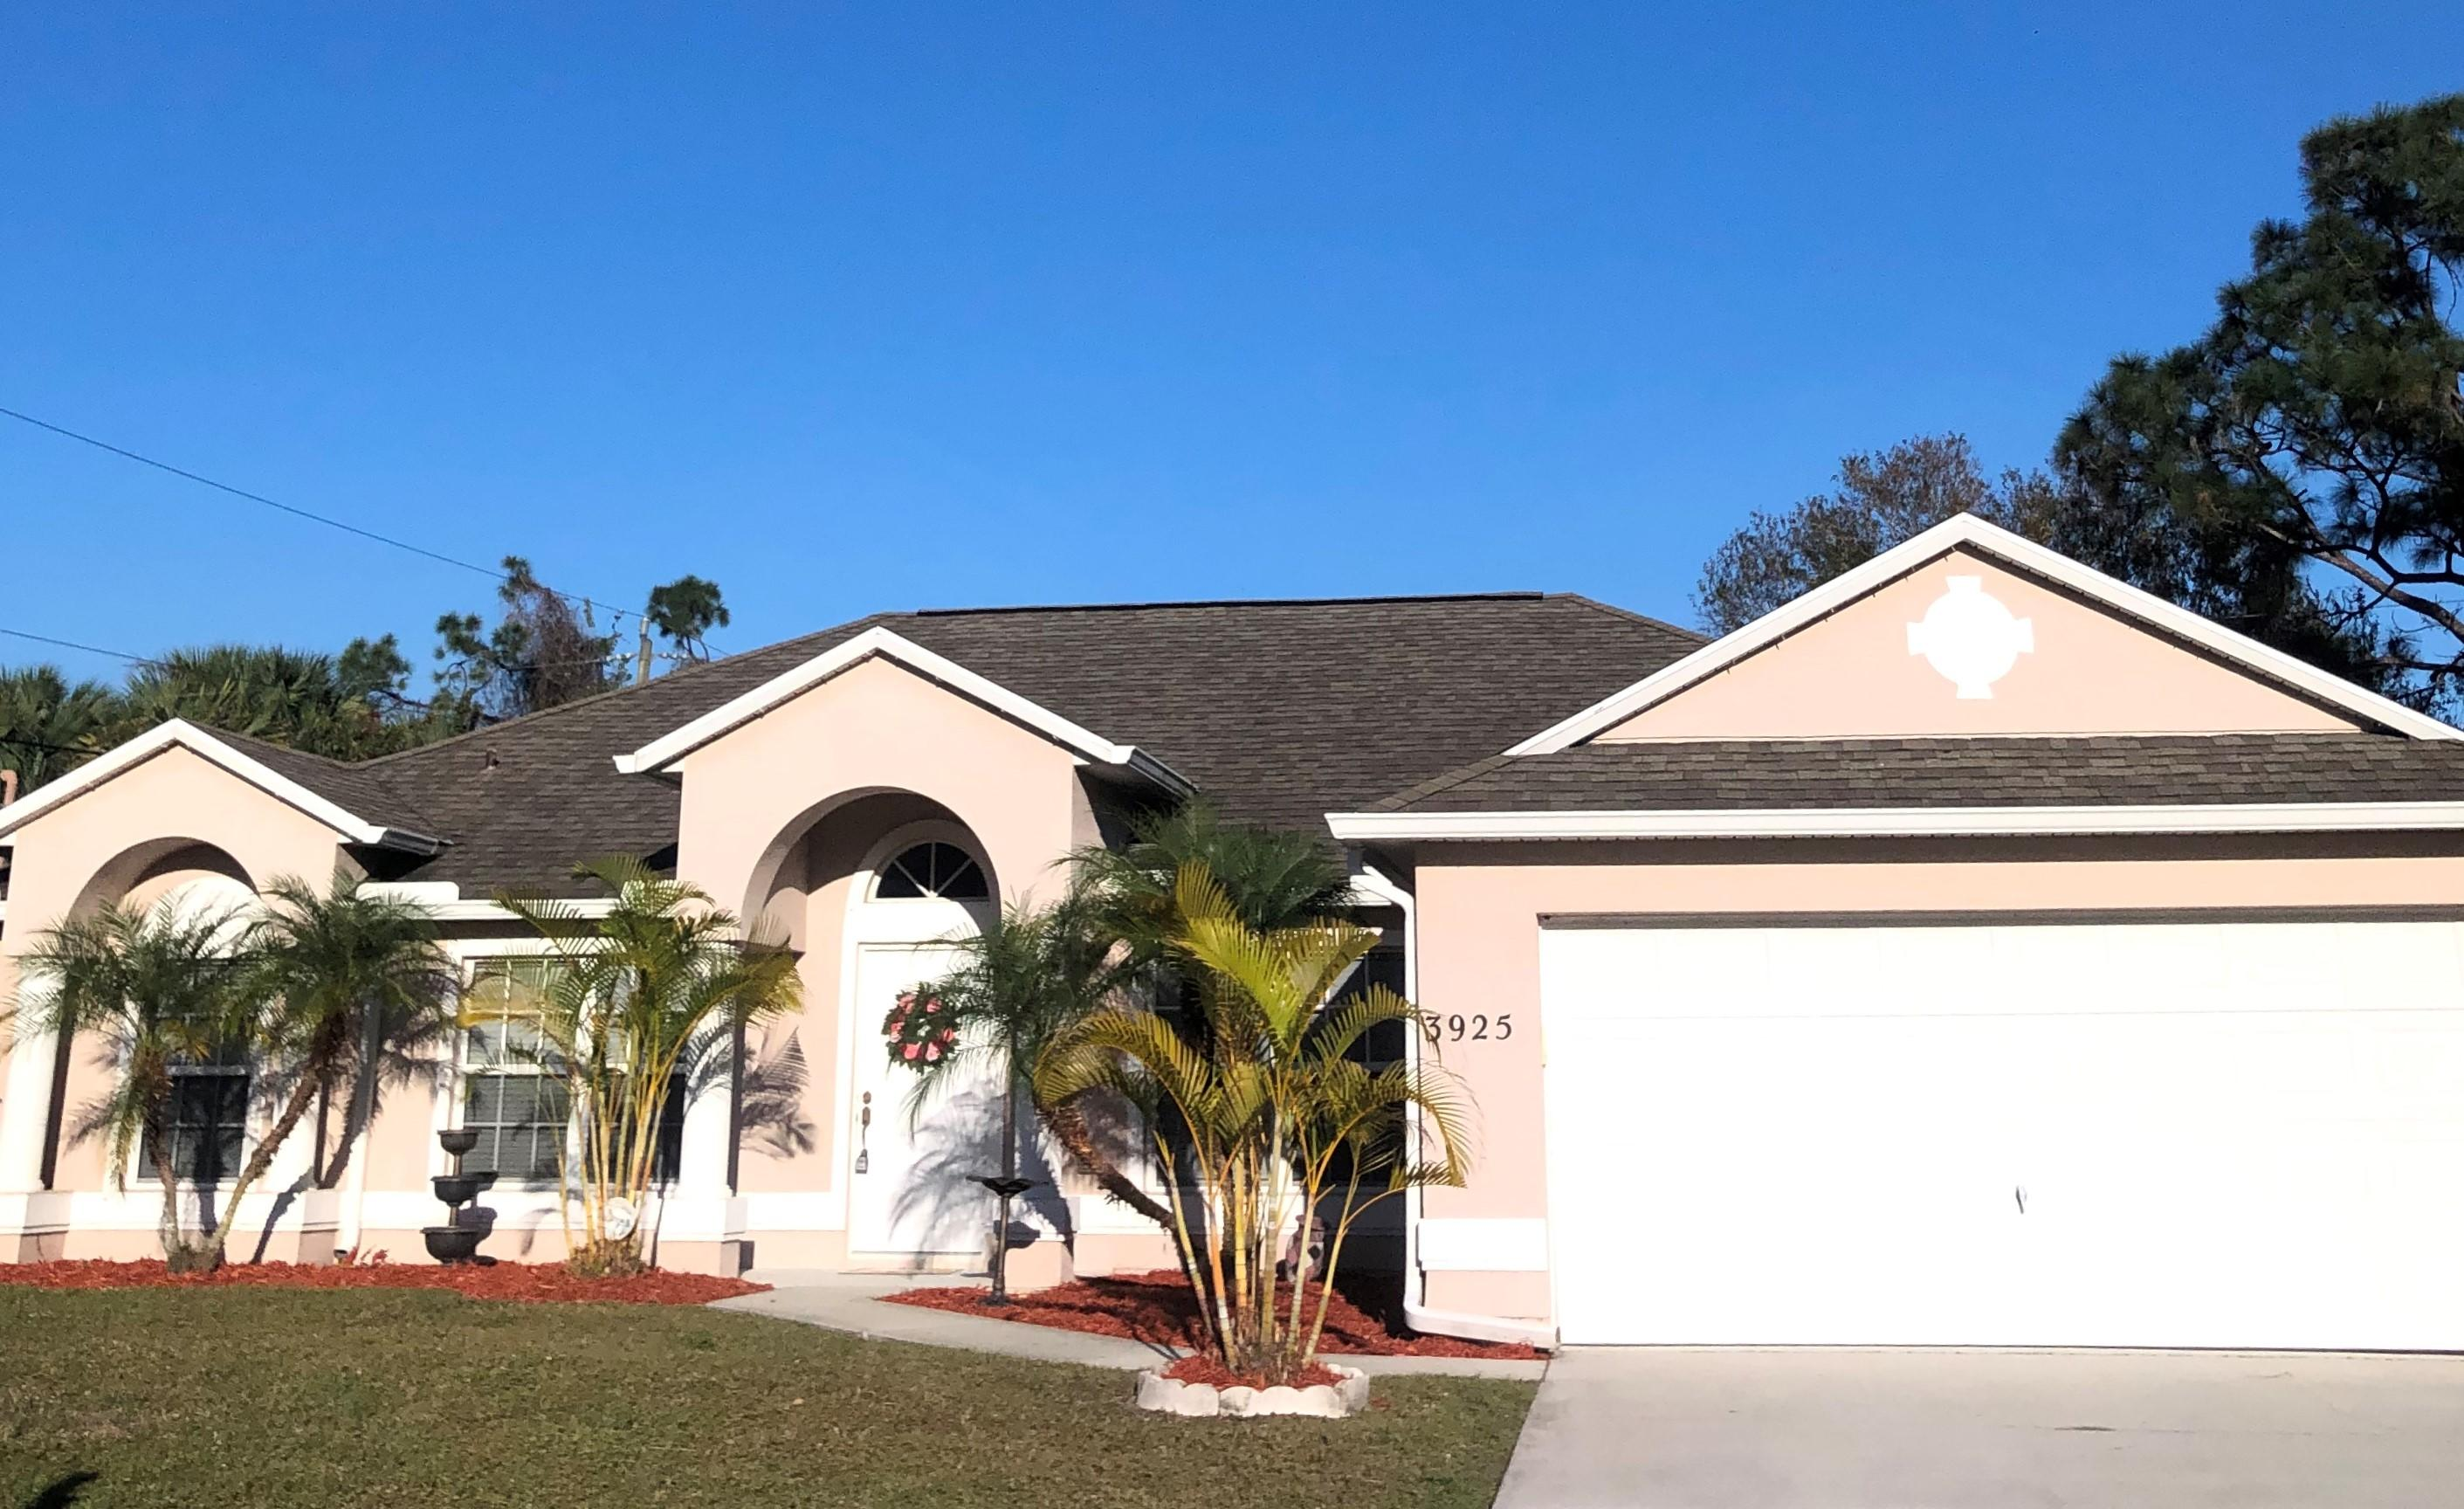 3925 SW Helmlinger Street - Port St Lucie, Florida